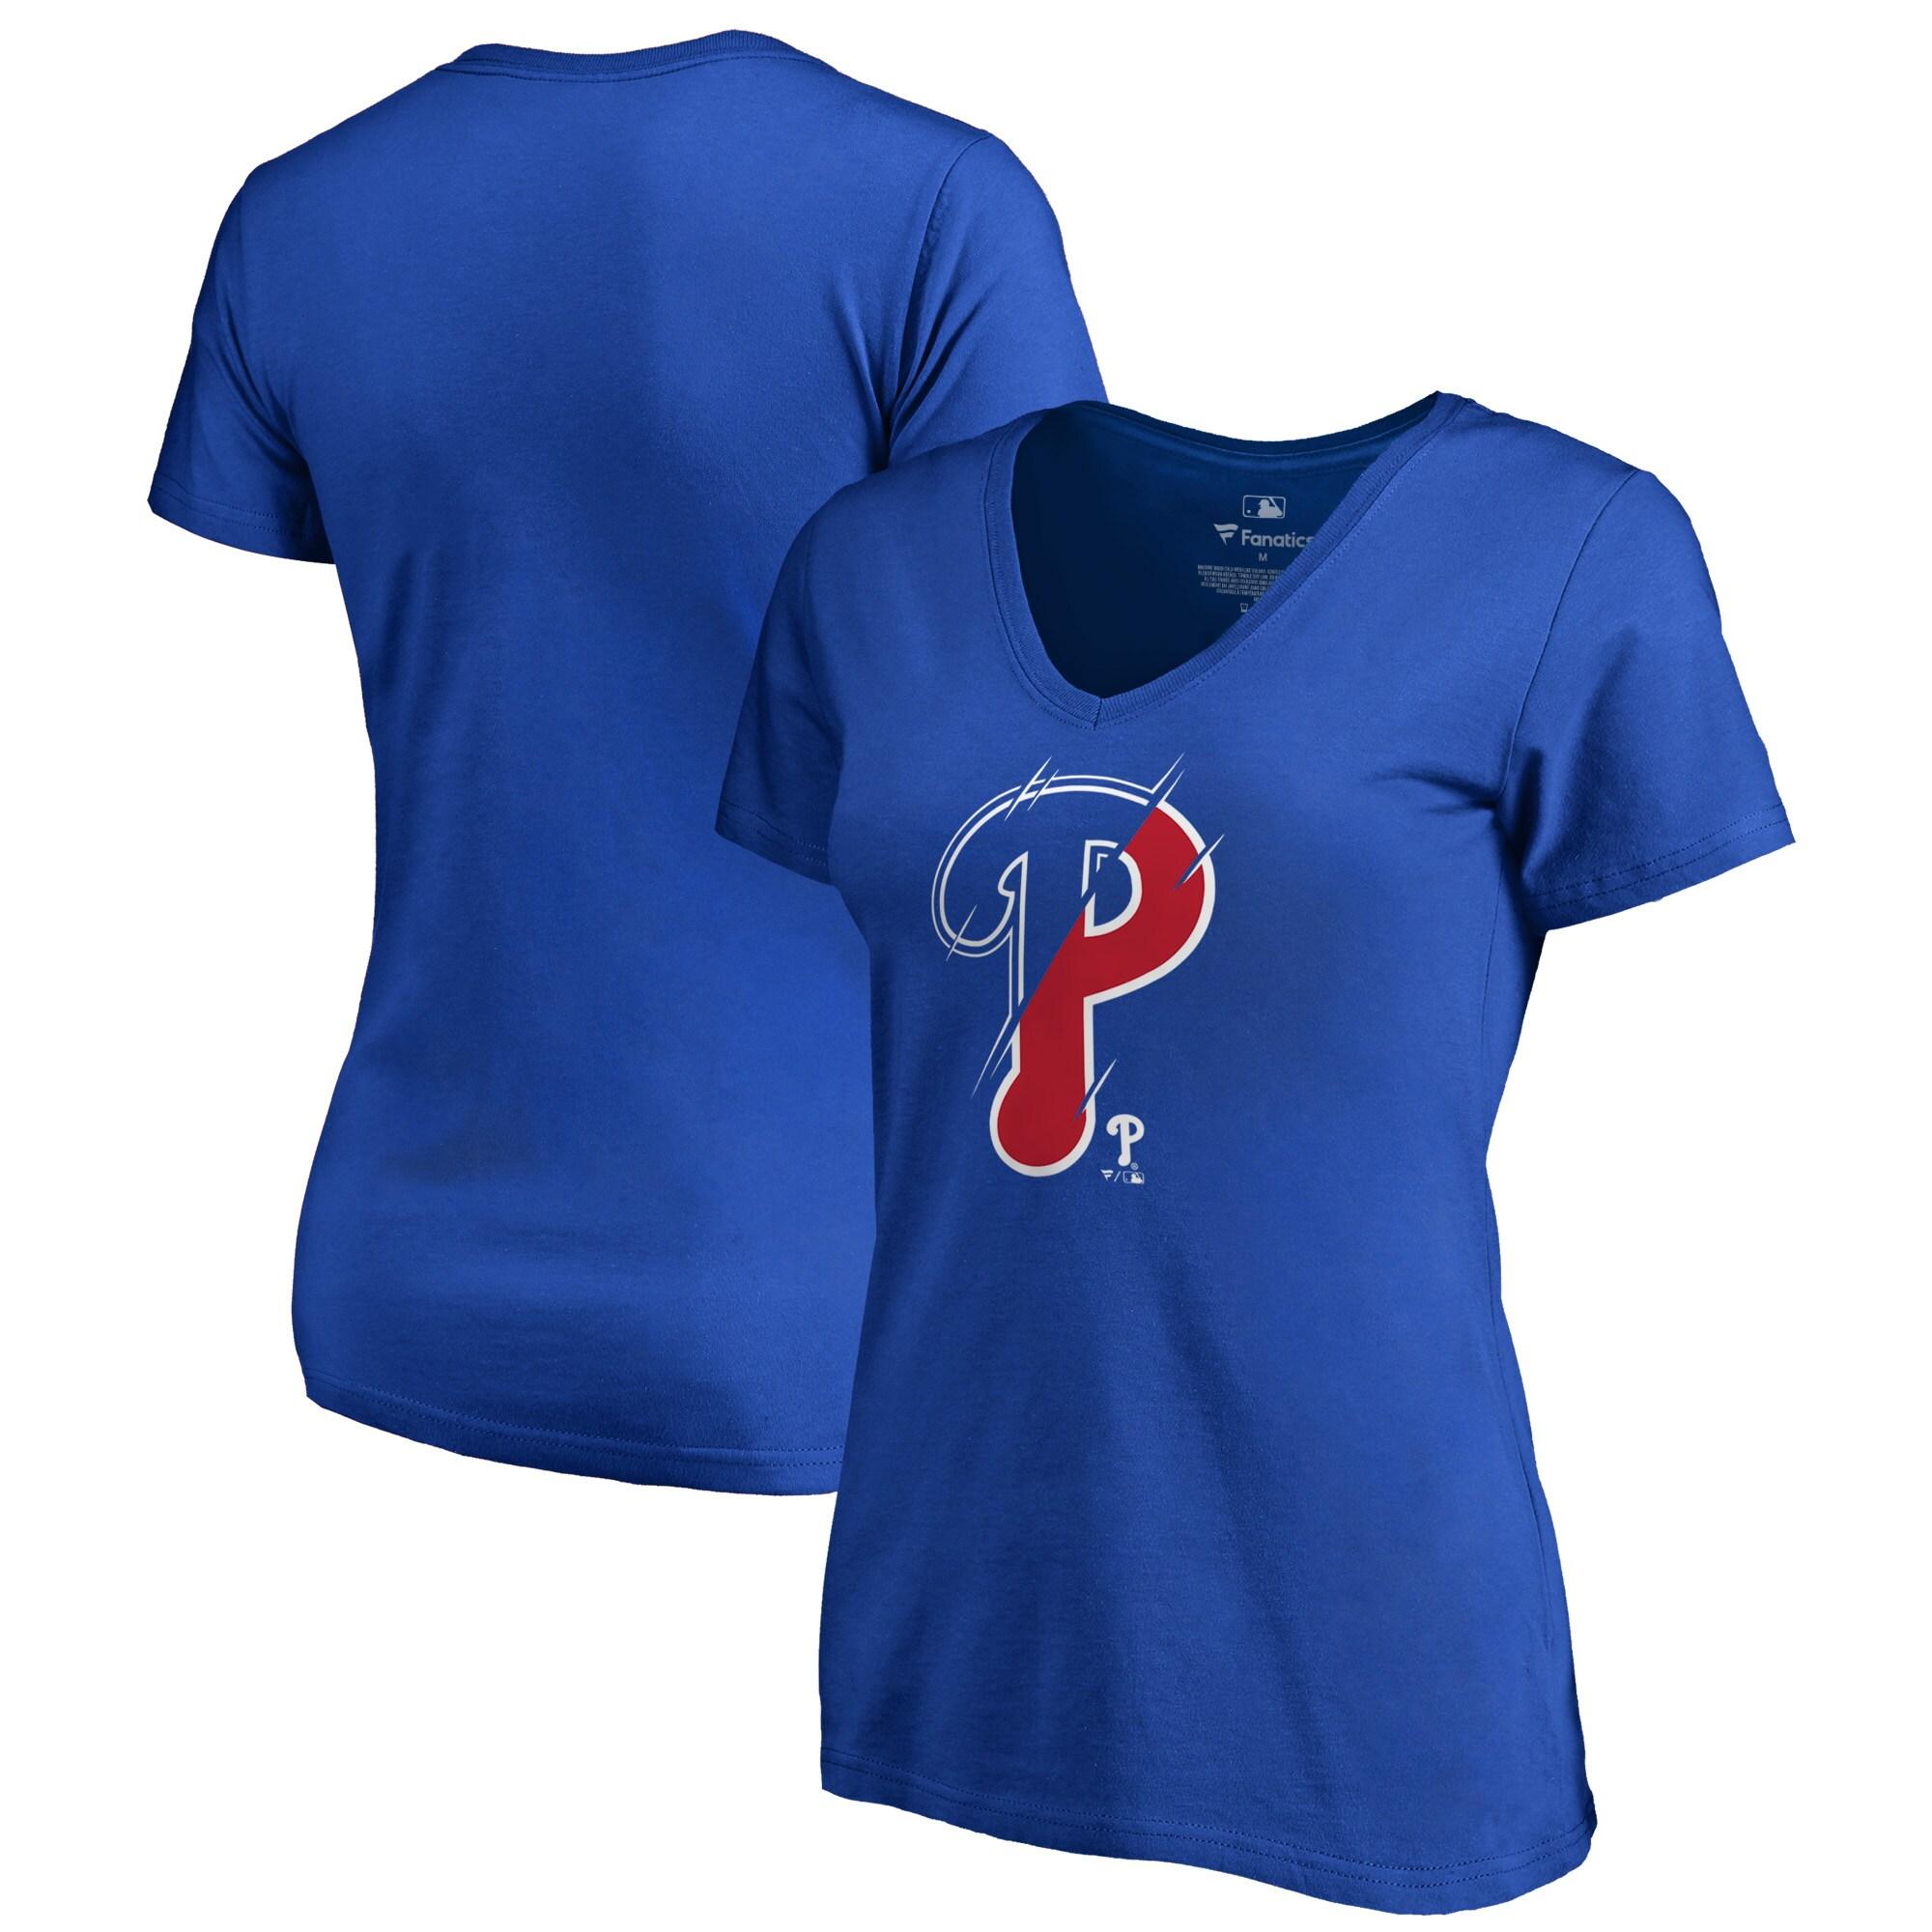 Philadelphia Phillies Fanatics Branded Women's X-Ray V-Neck T-Shirt - Royal